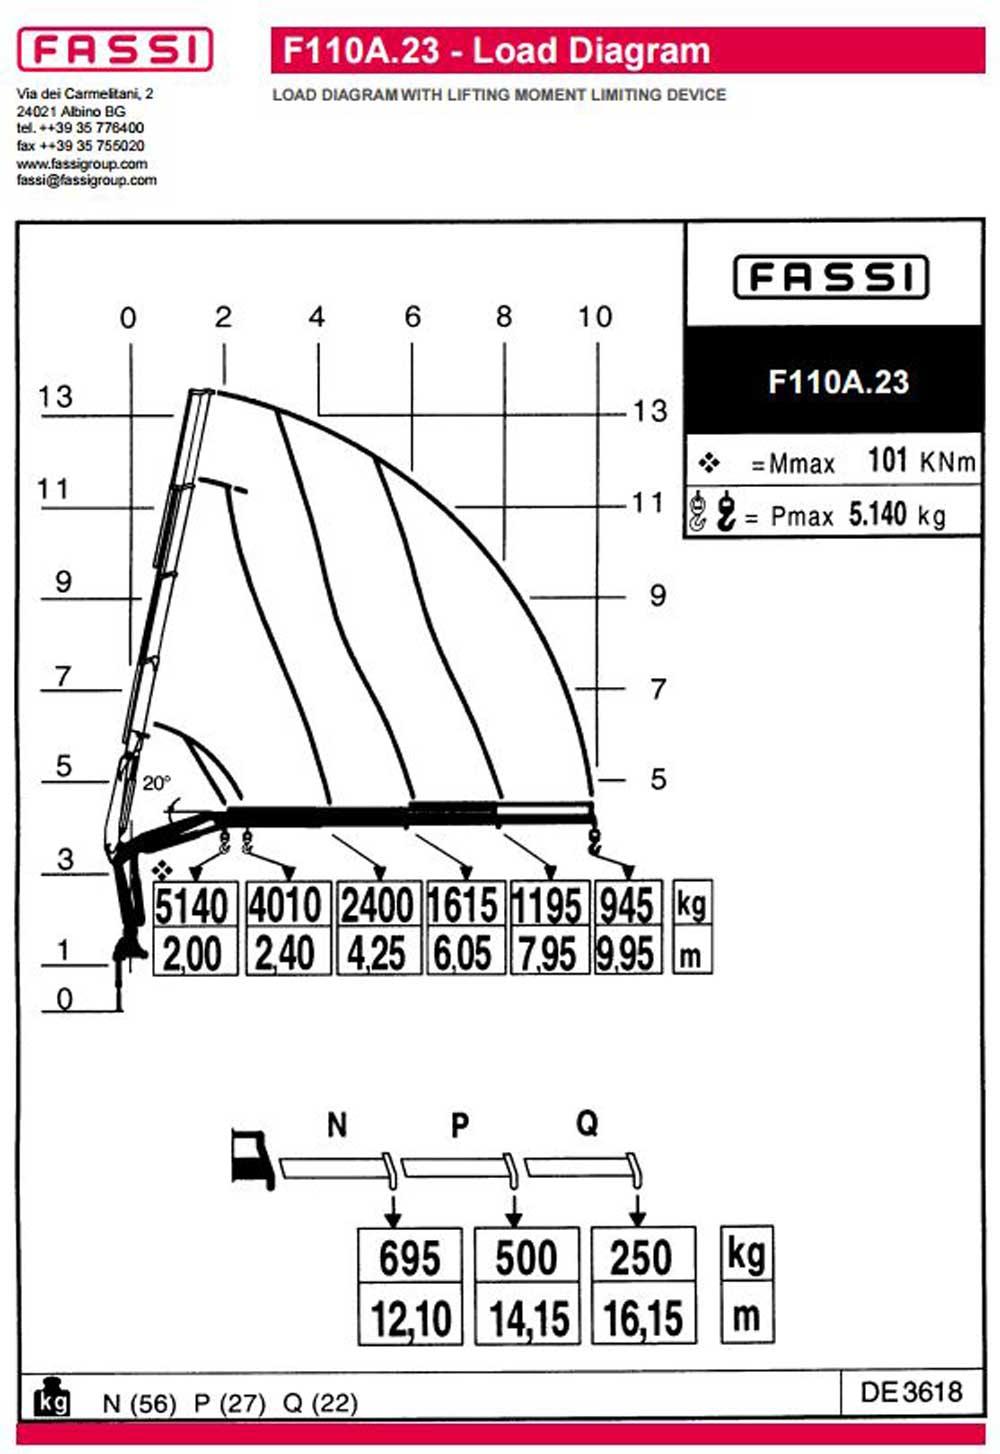 5 7 Ton Fassi F110a 23